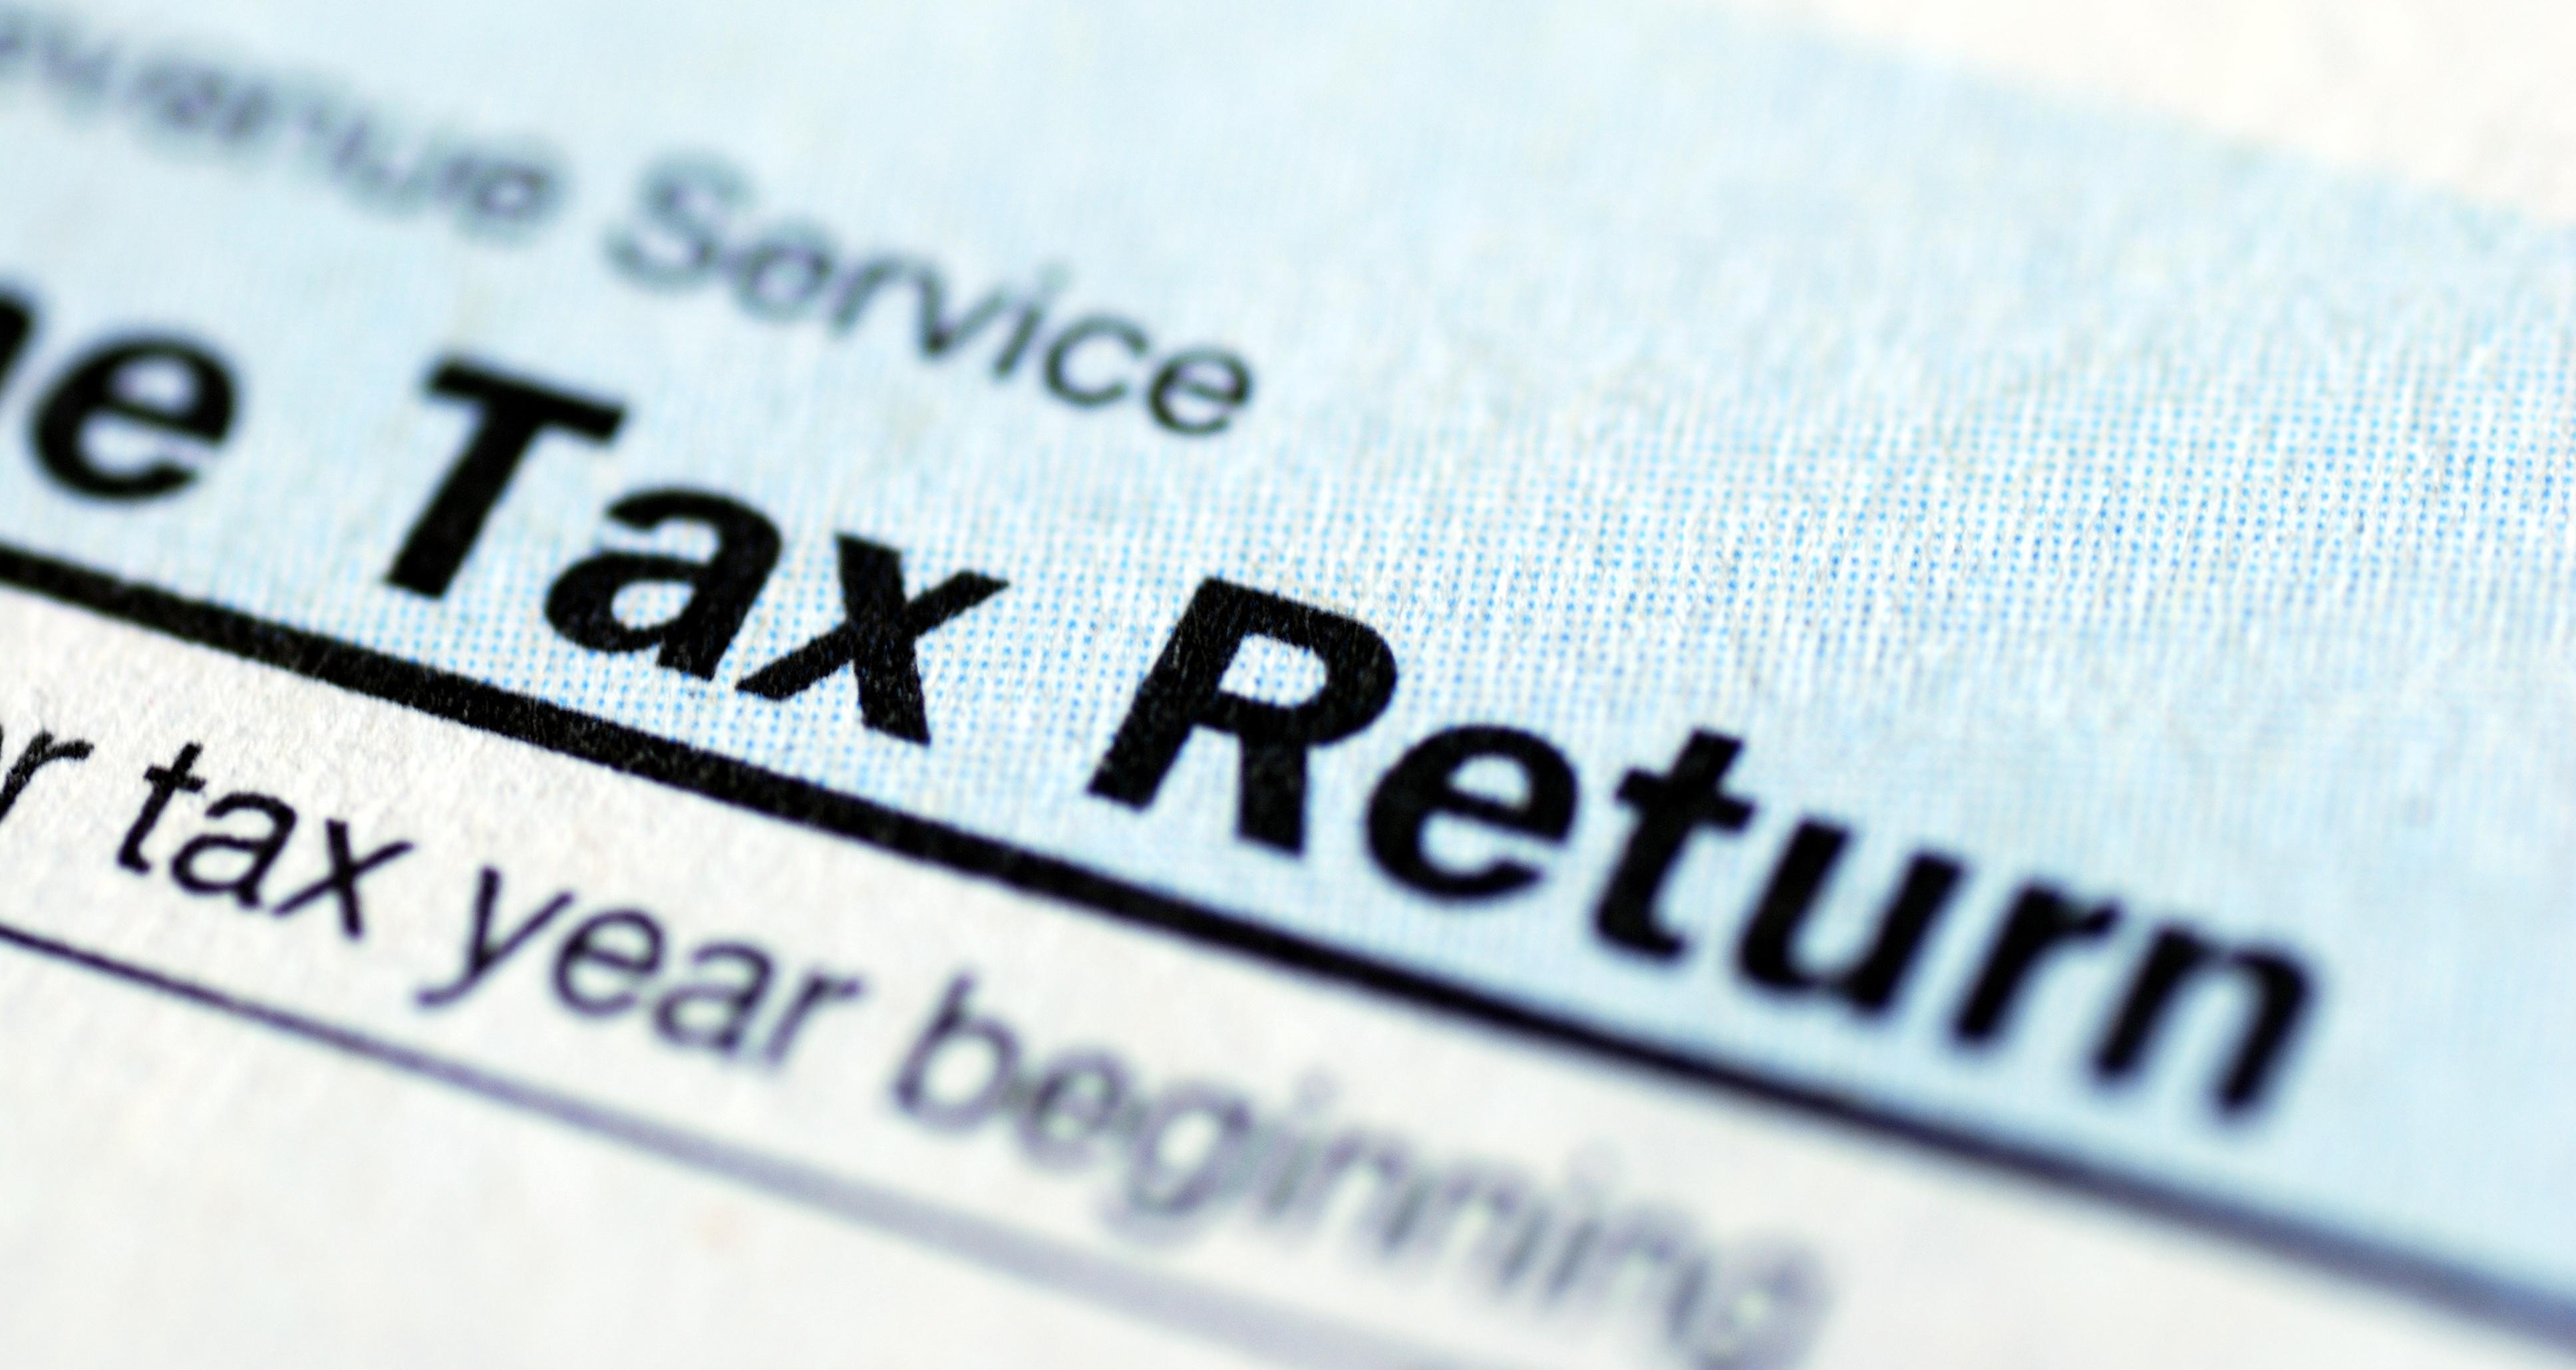 The final tax return filing deadline is approaching fast…